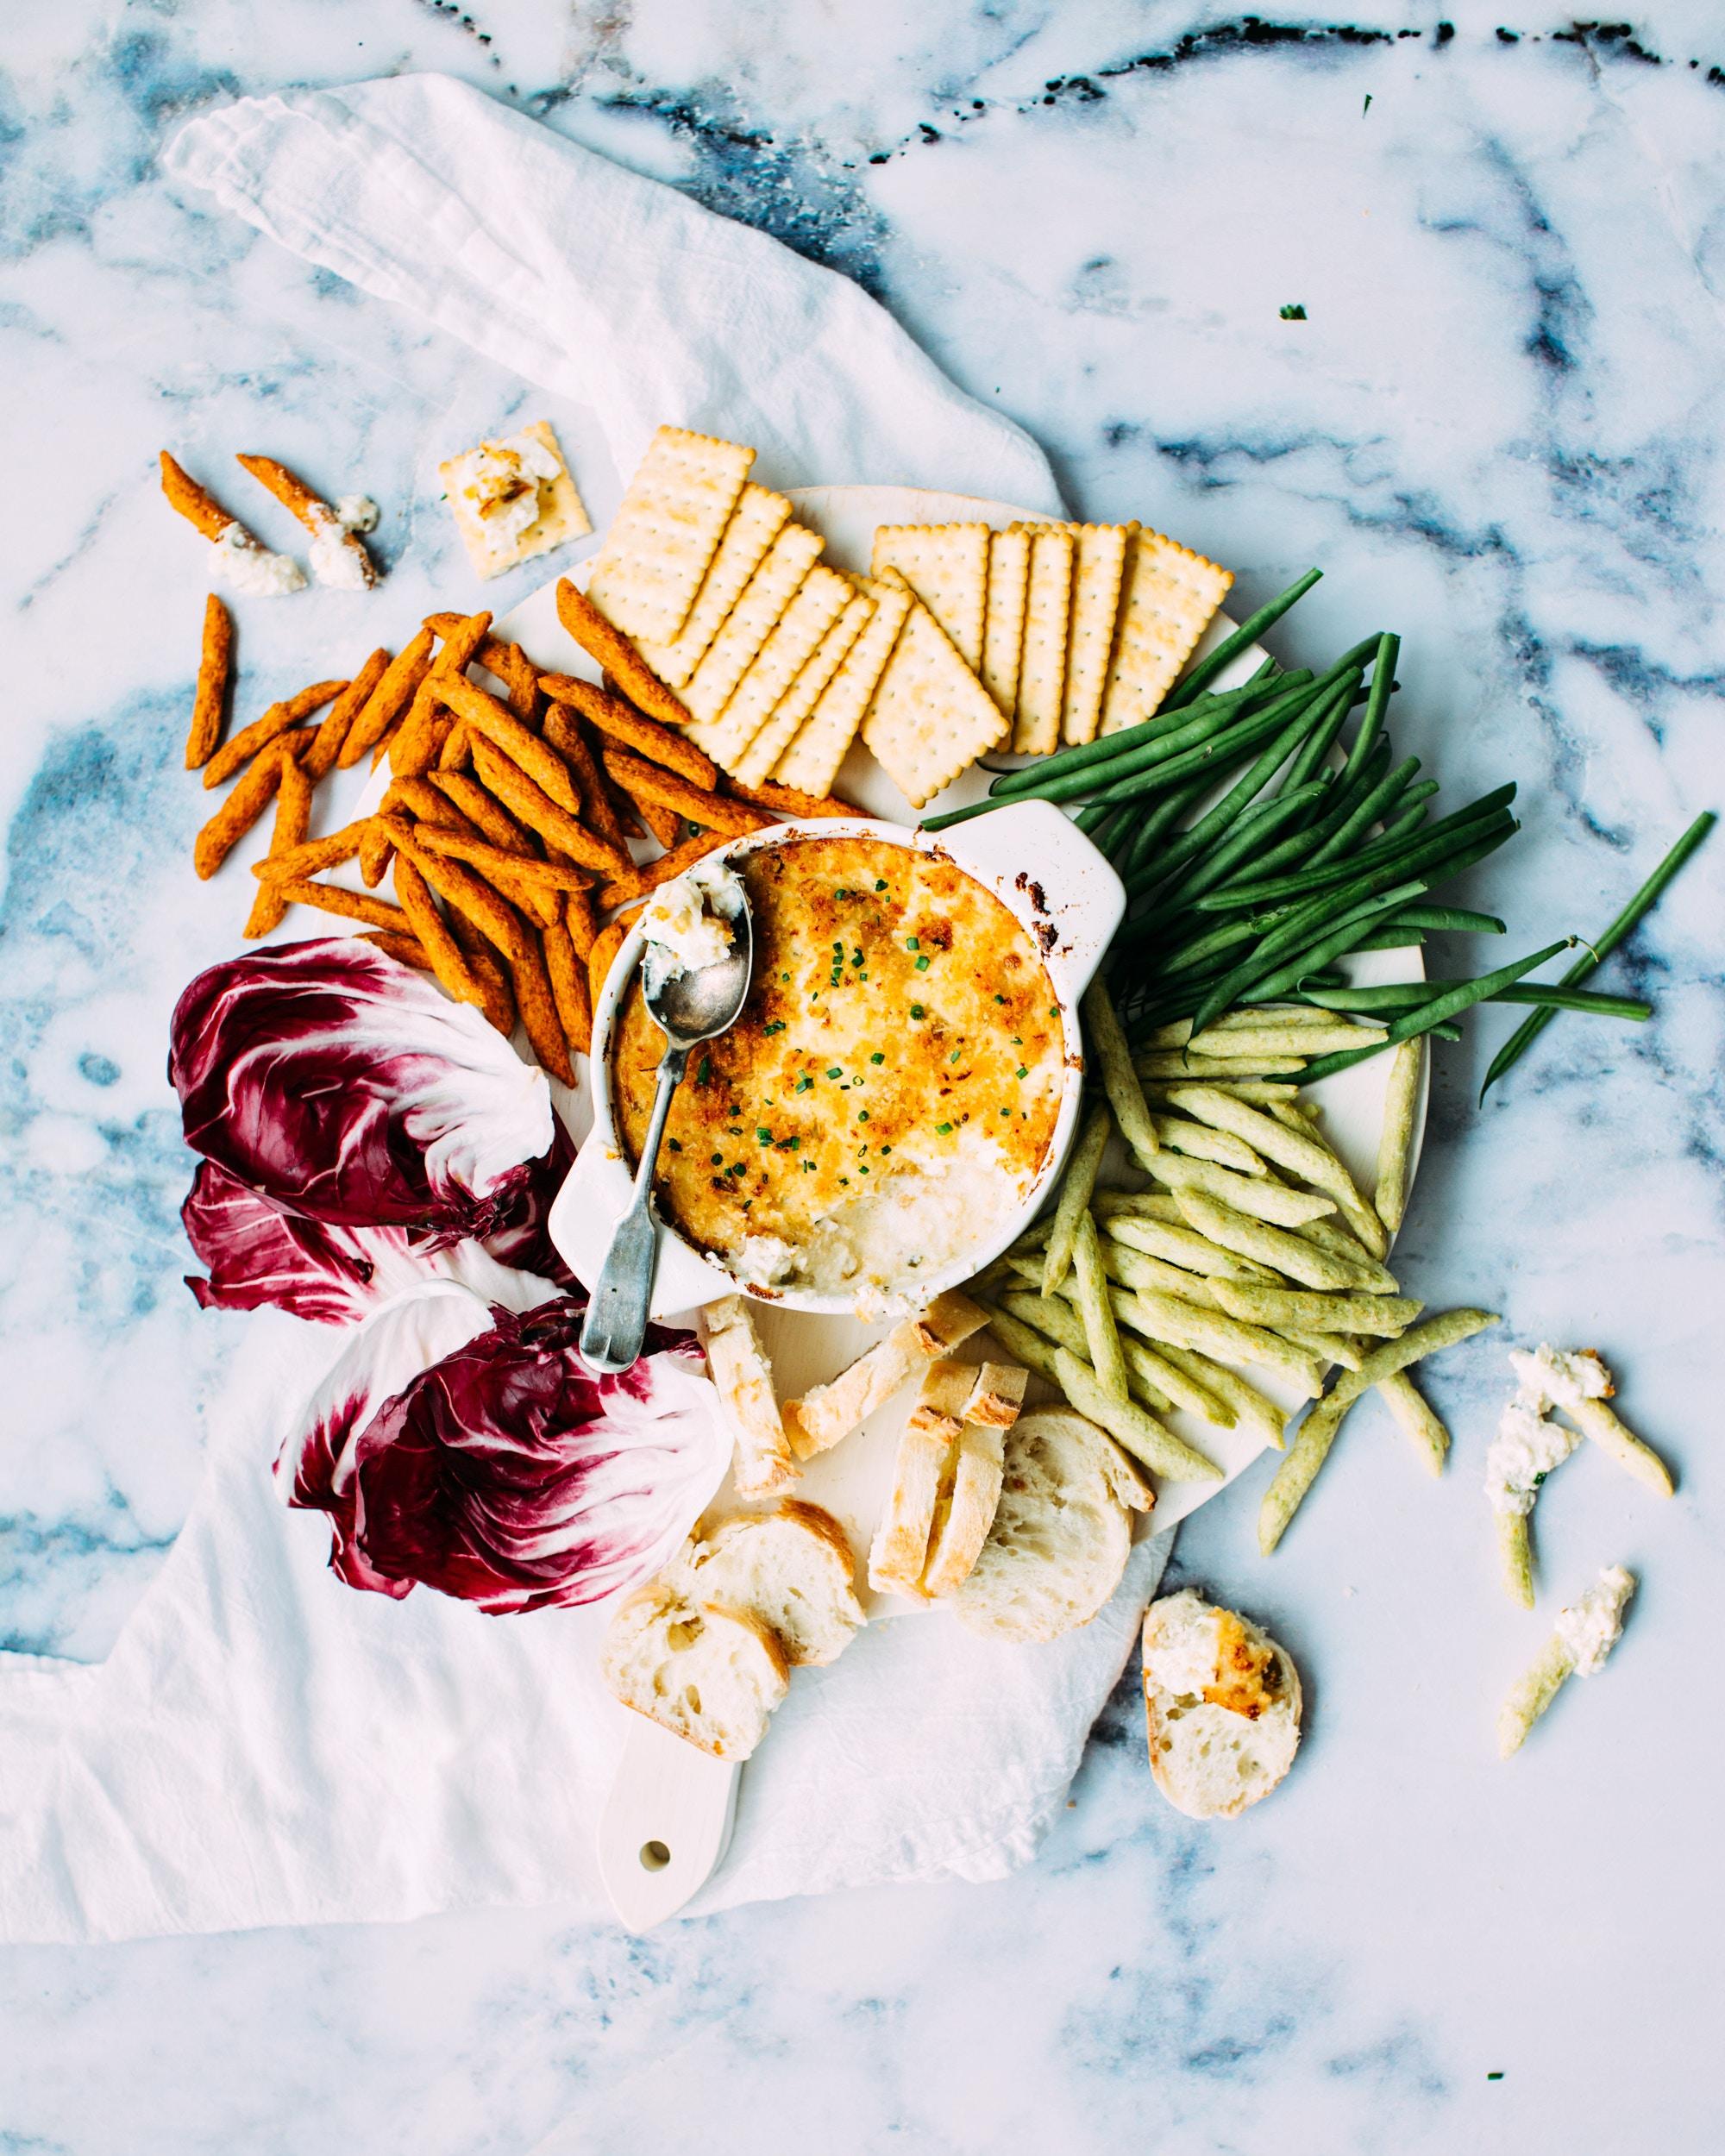 food-photographer-jennifer-pallian-200439-unsplash.jpg